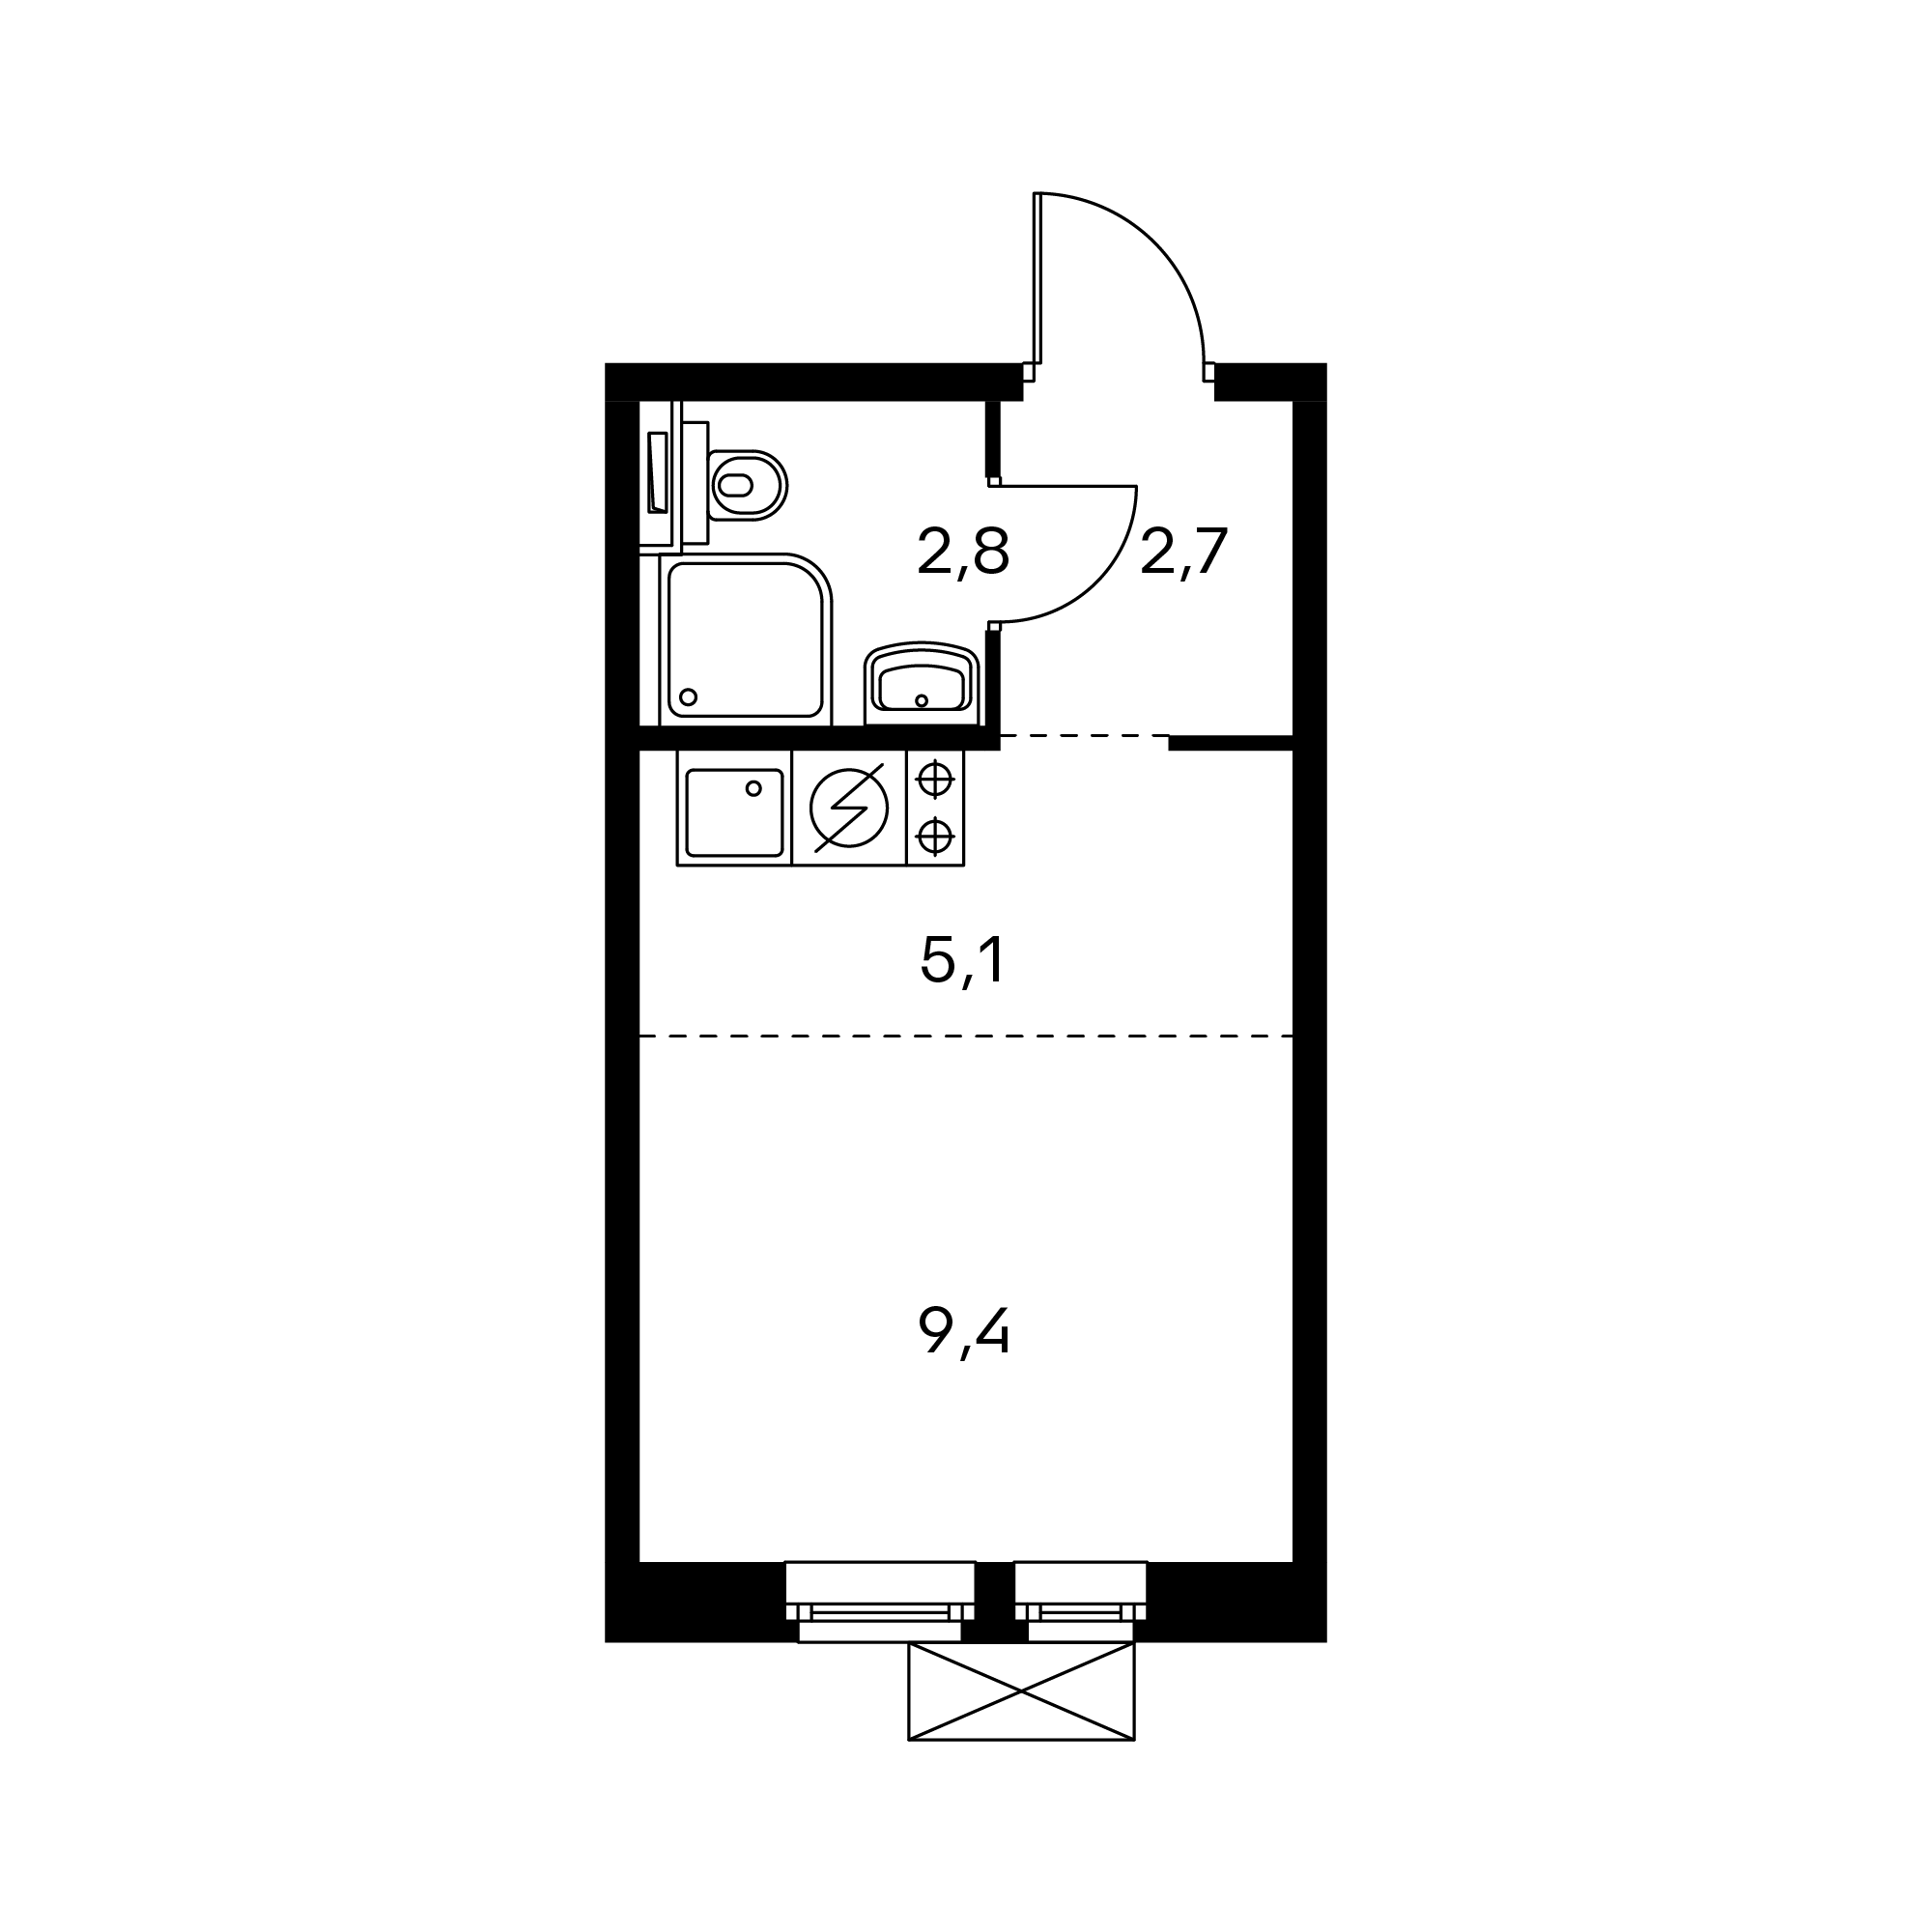 1NS1_3.6-1_1